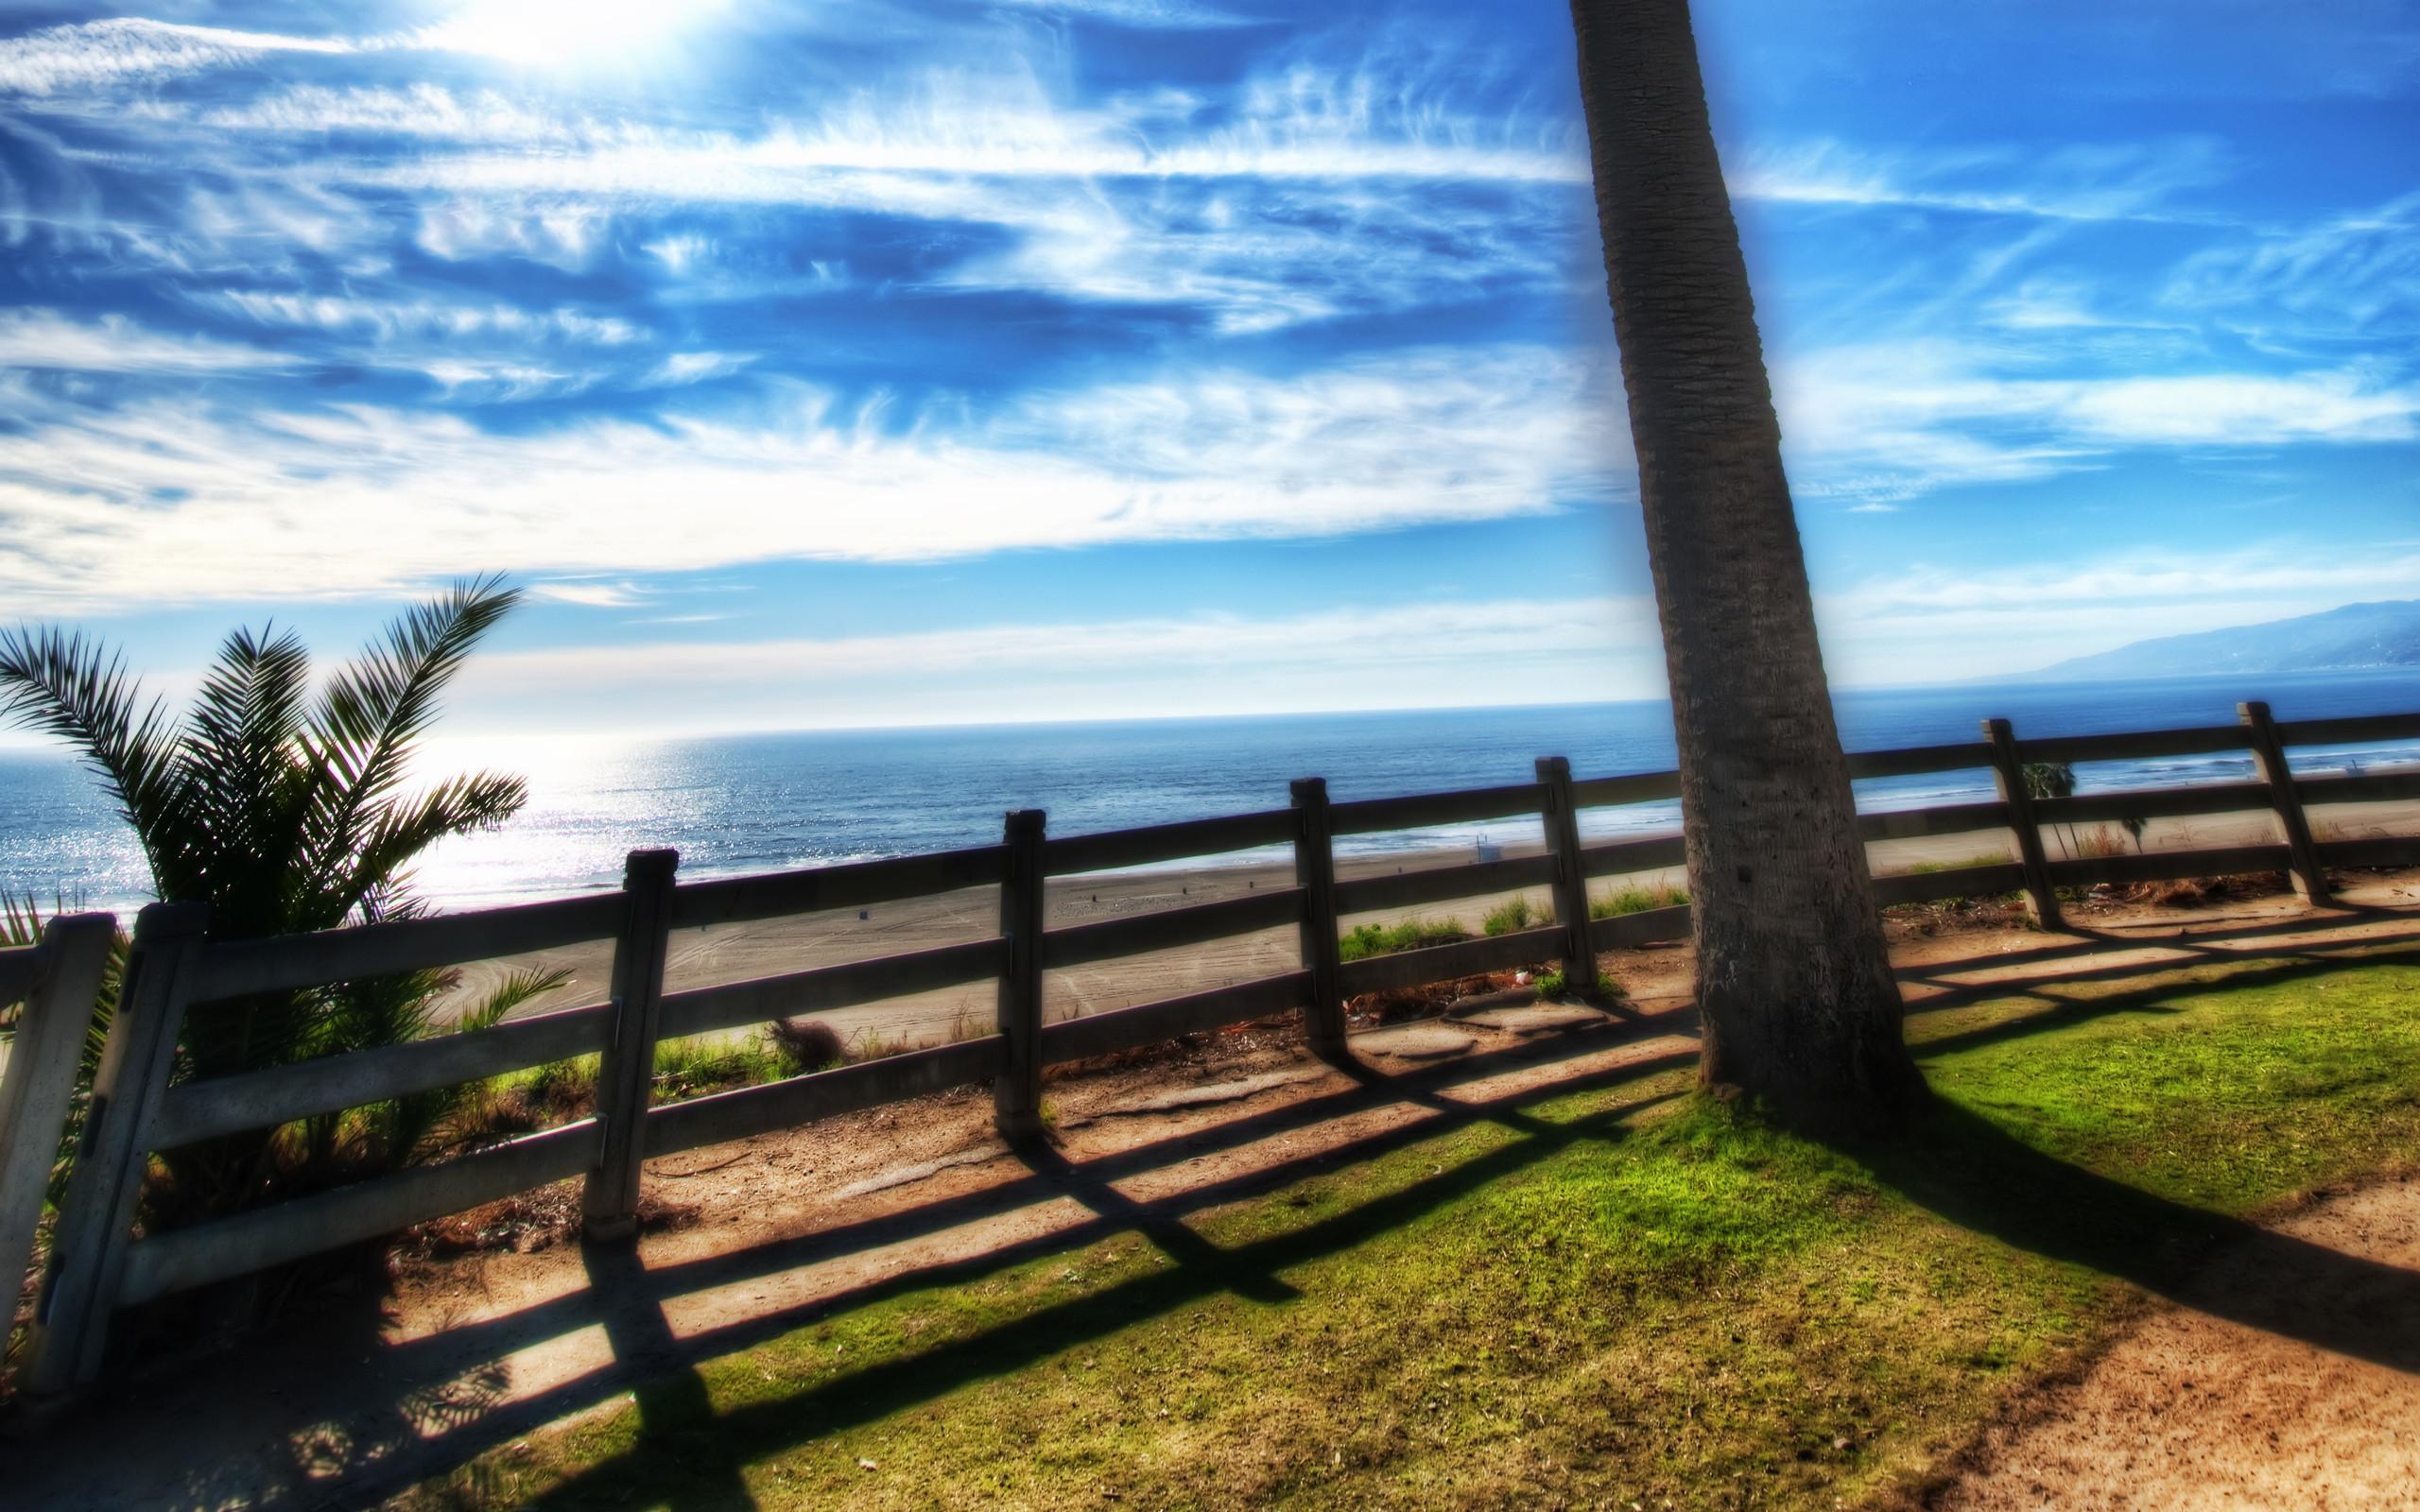 California IPhone Wallpaper 50 Images